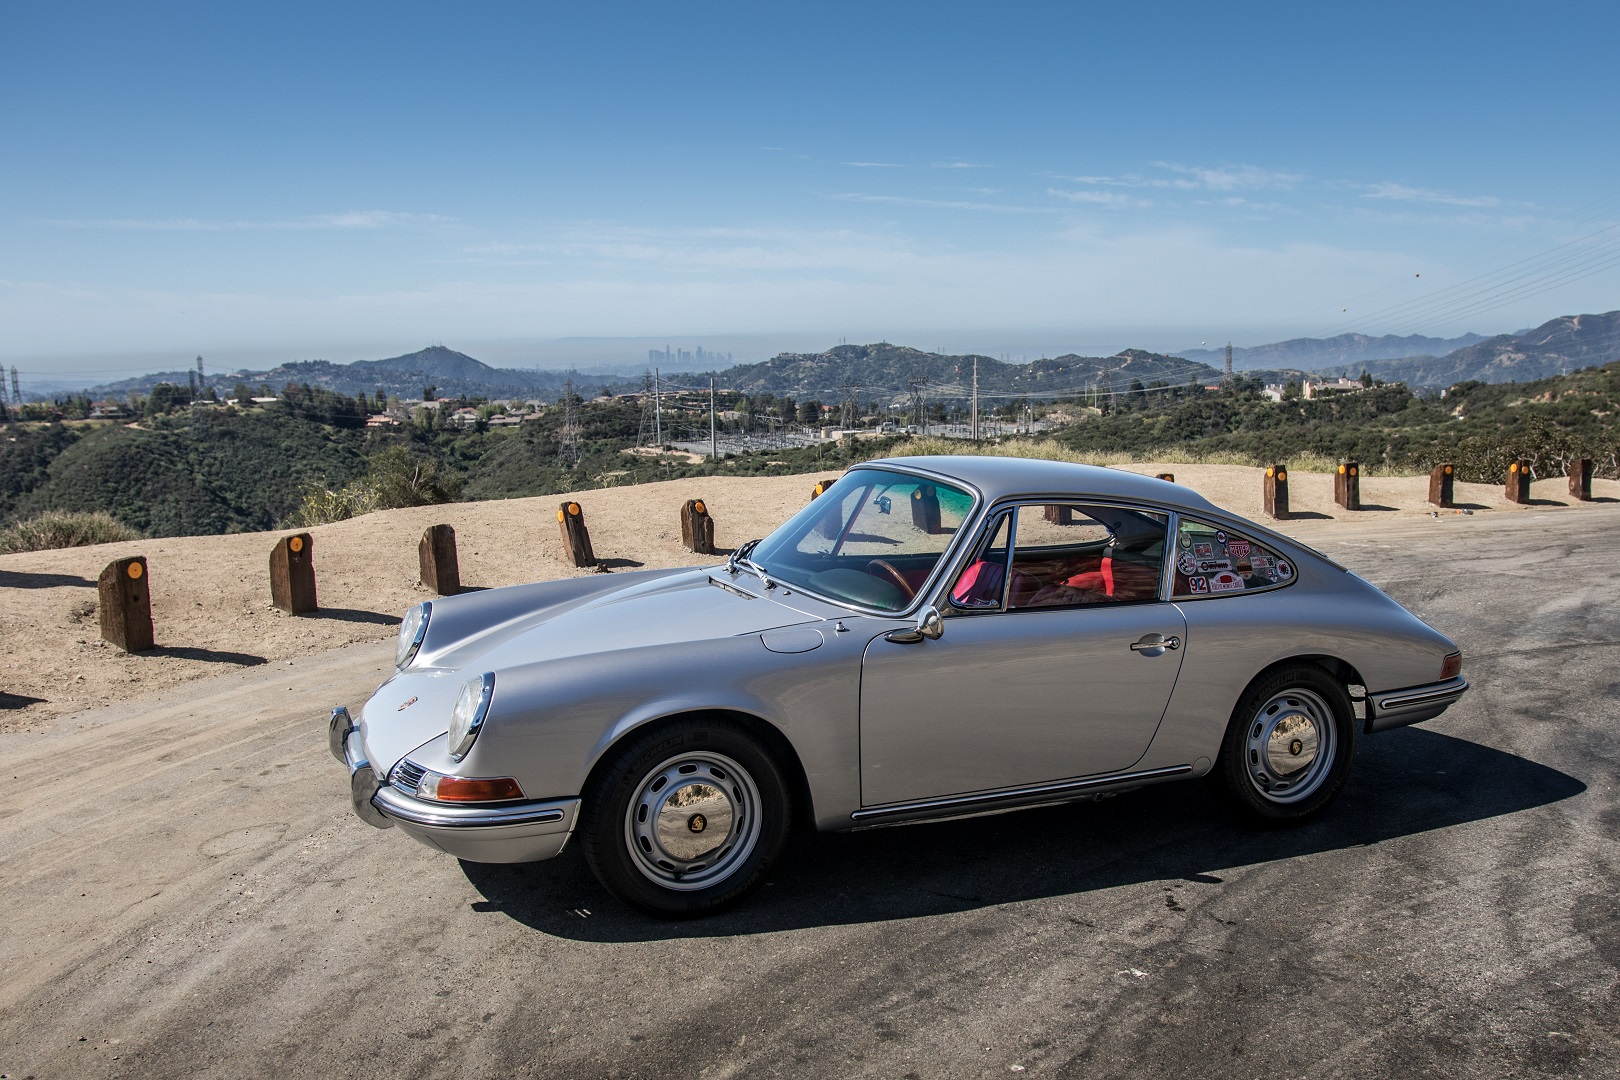 Electric Porsche 912 Side View